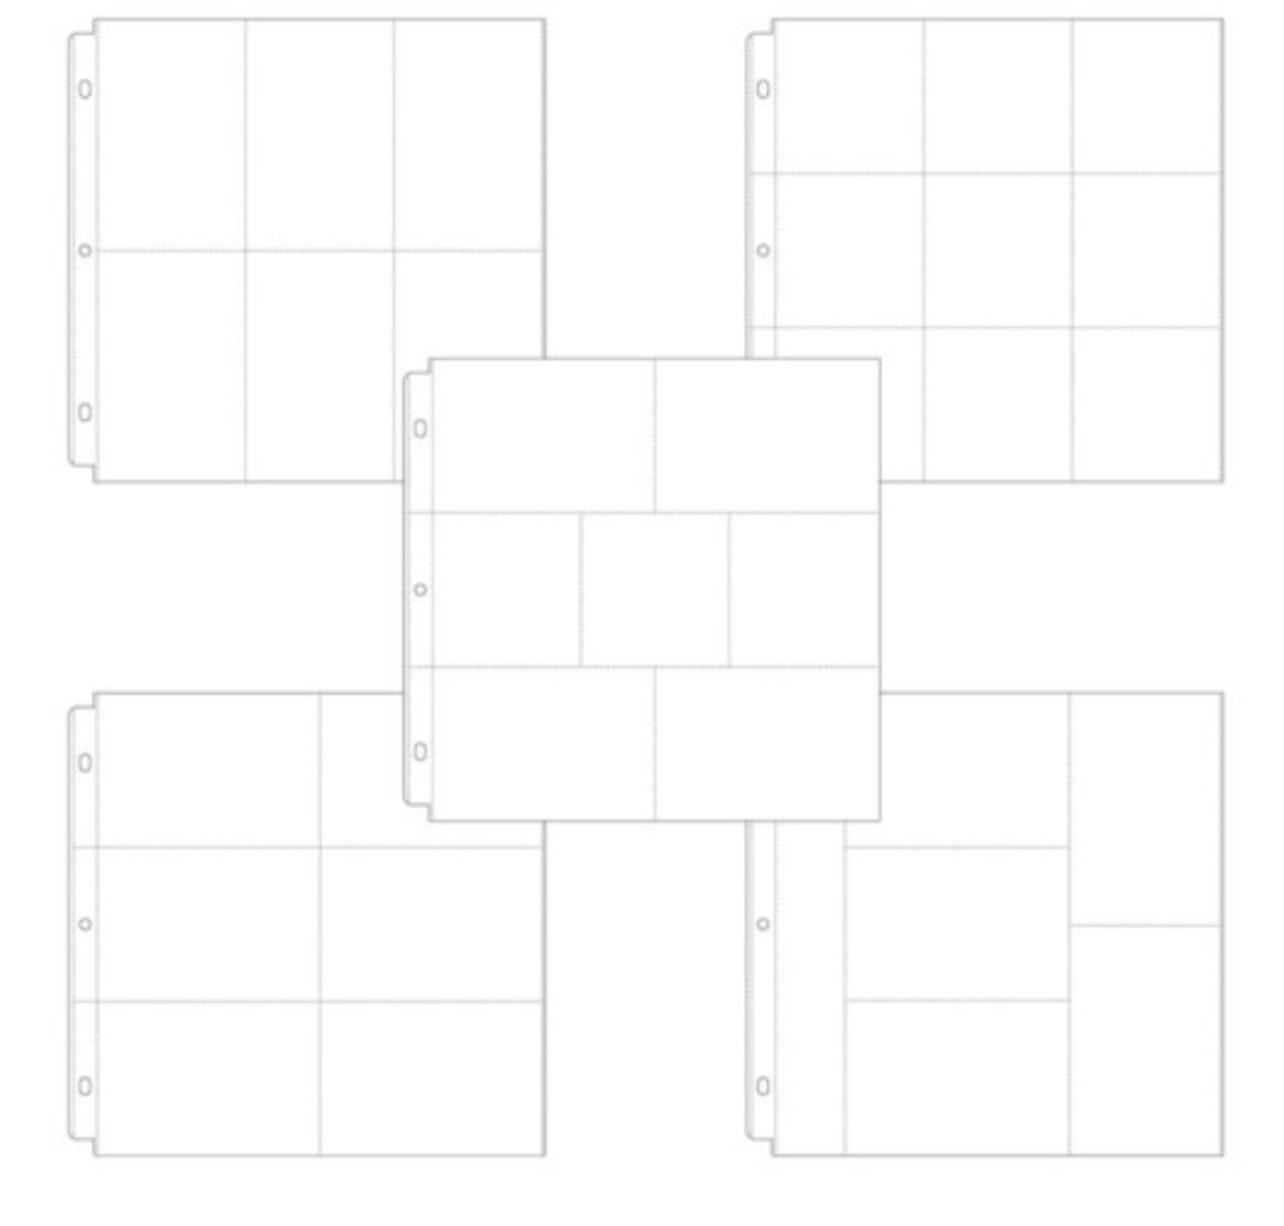 Protetor de Páginas Scrapbook.com 12x12 polegadas - Kit com 10 Embalagem Sortida - Project Life - Kit 1